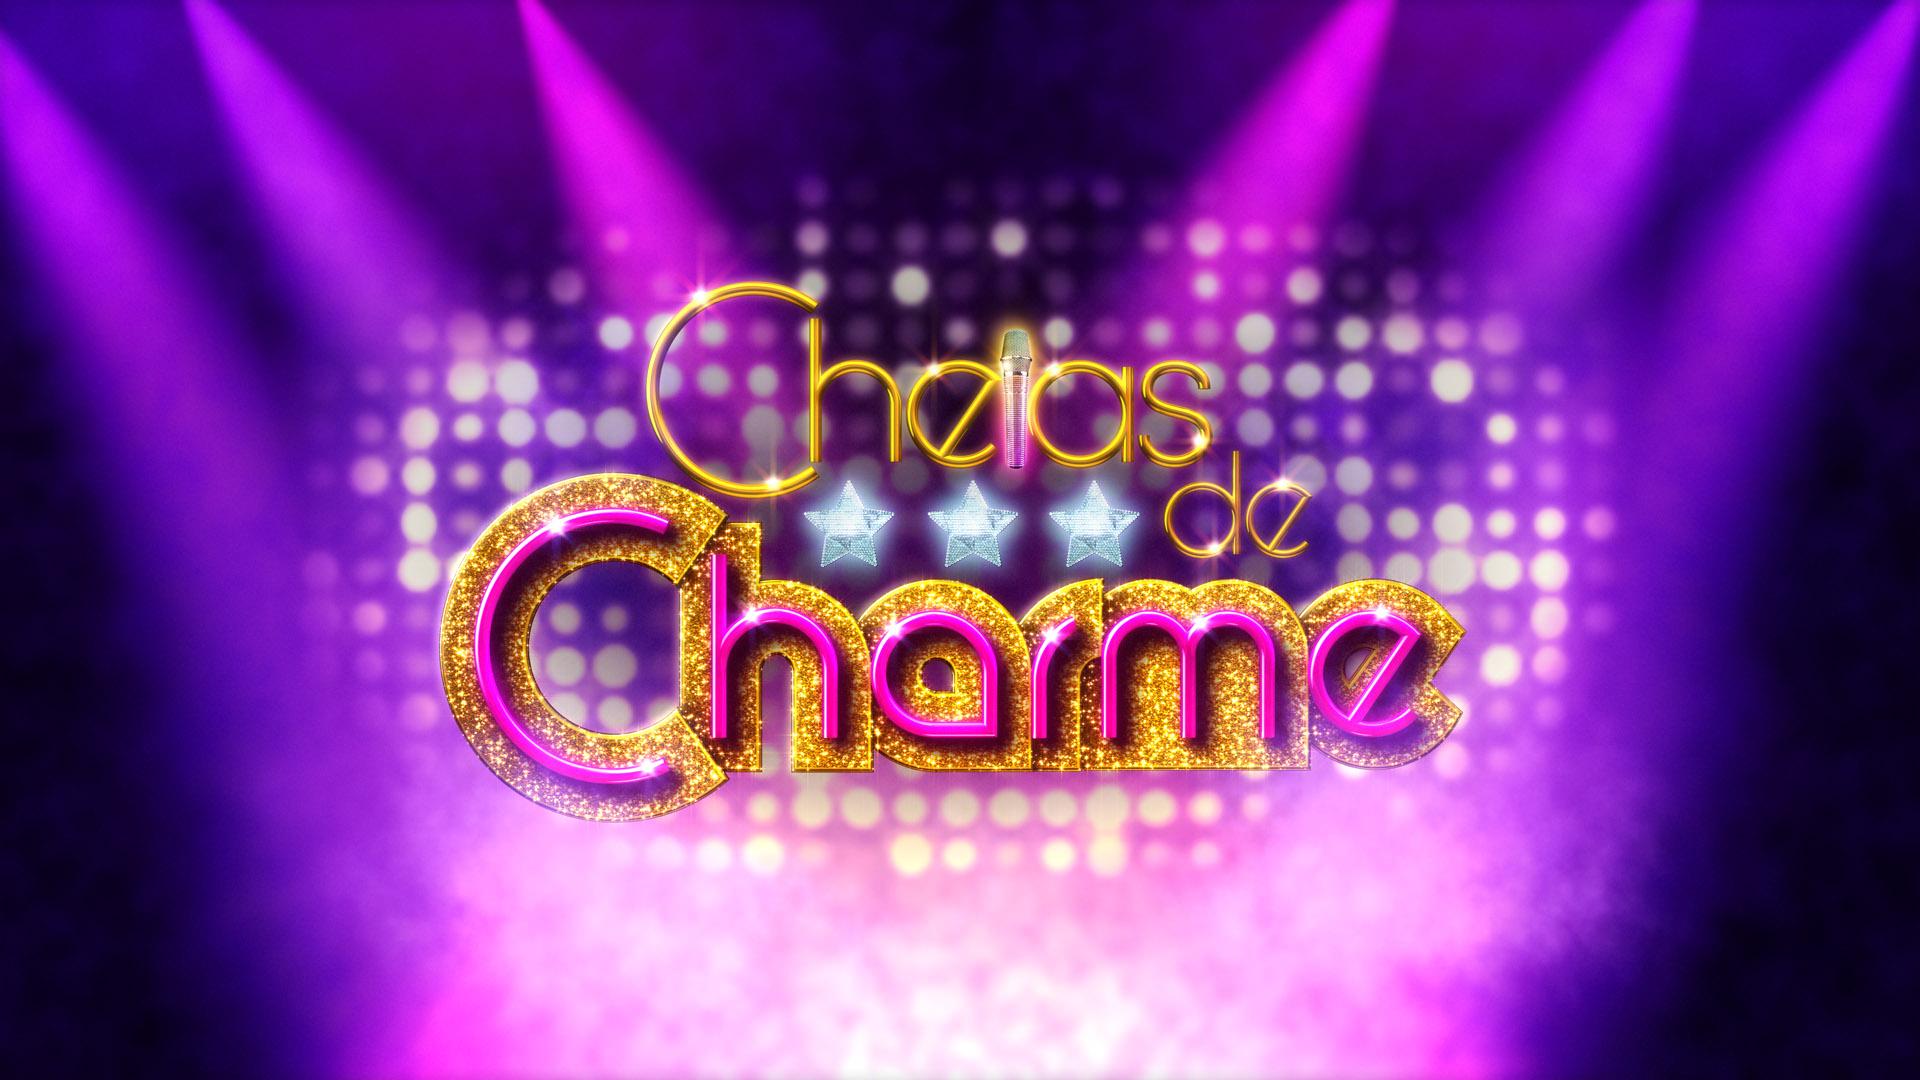 cheias-de-charme-logomarca1